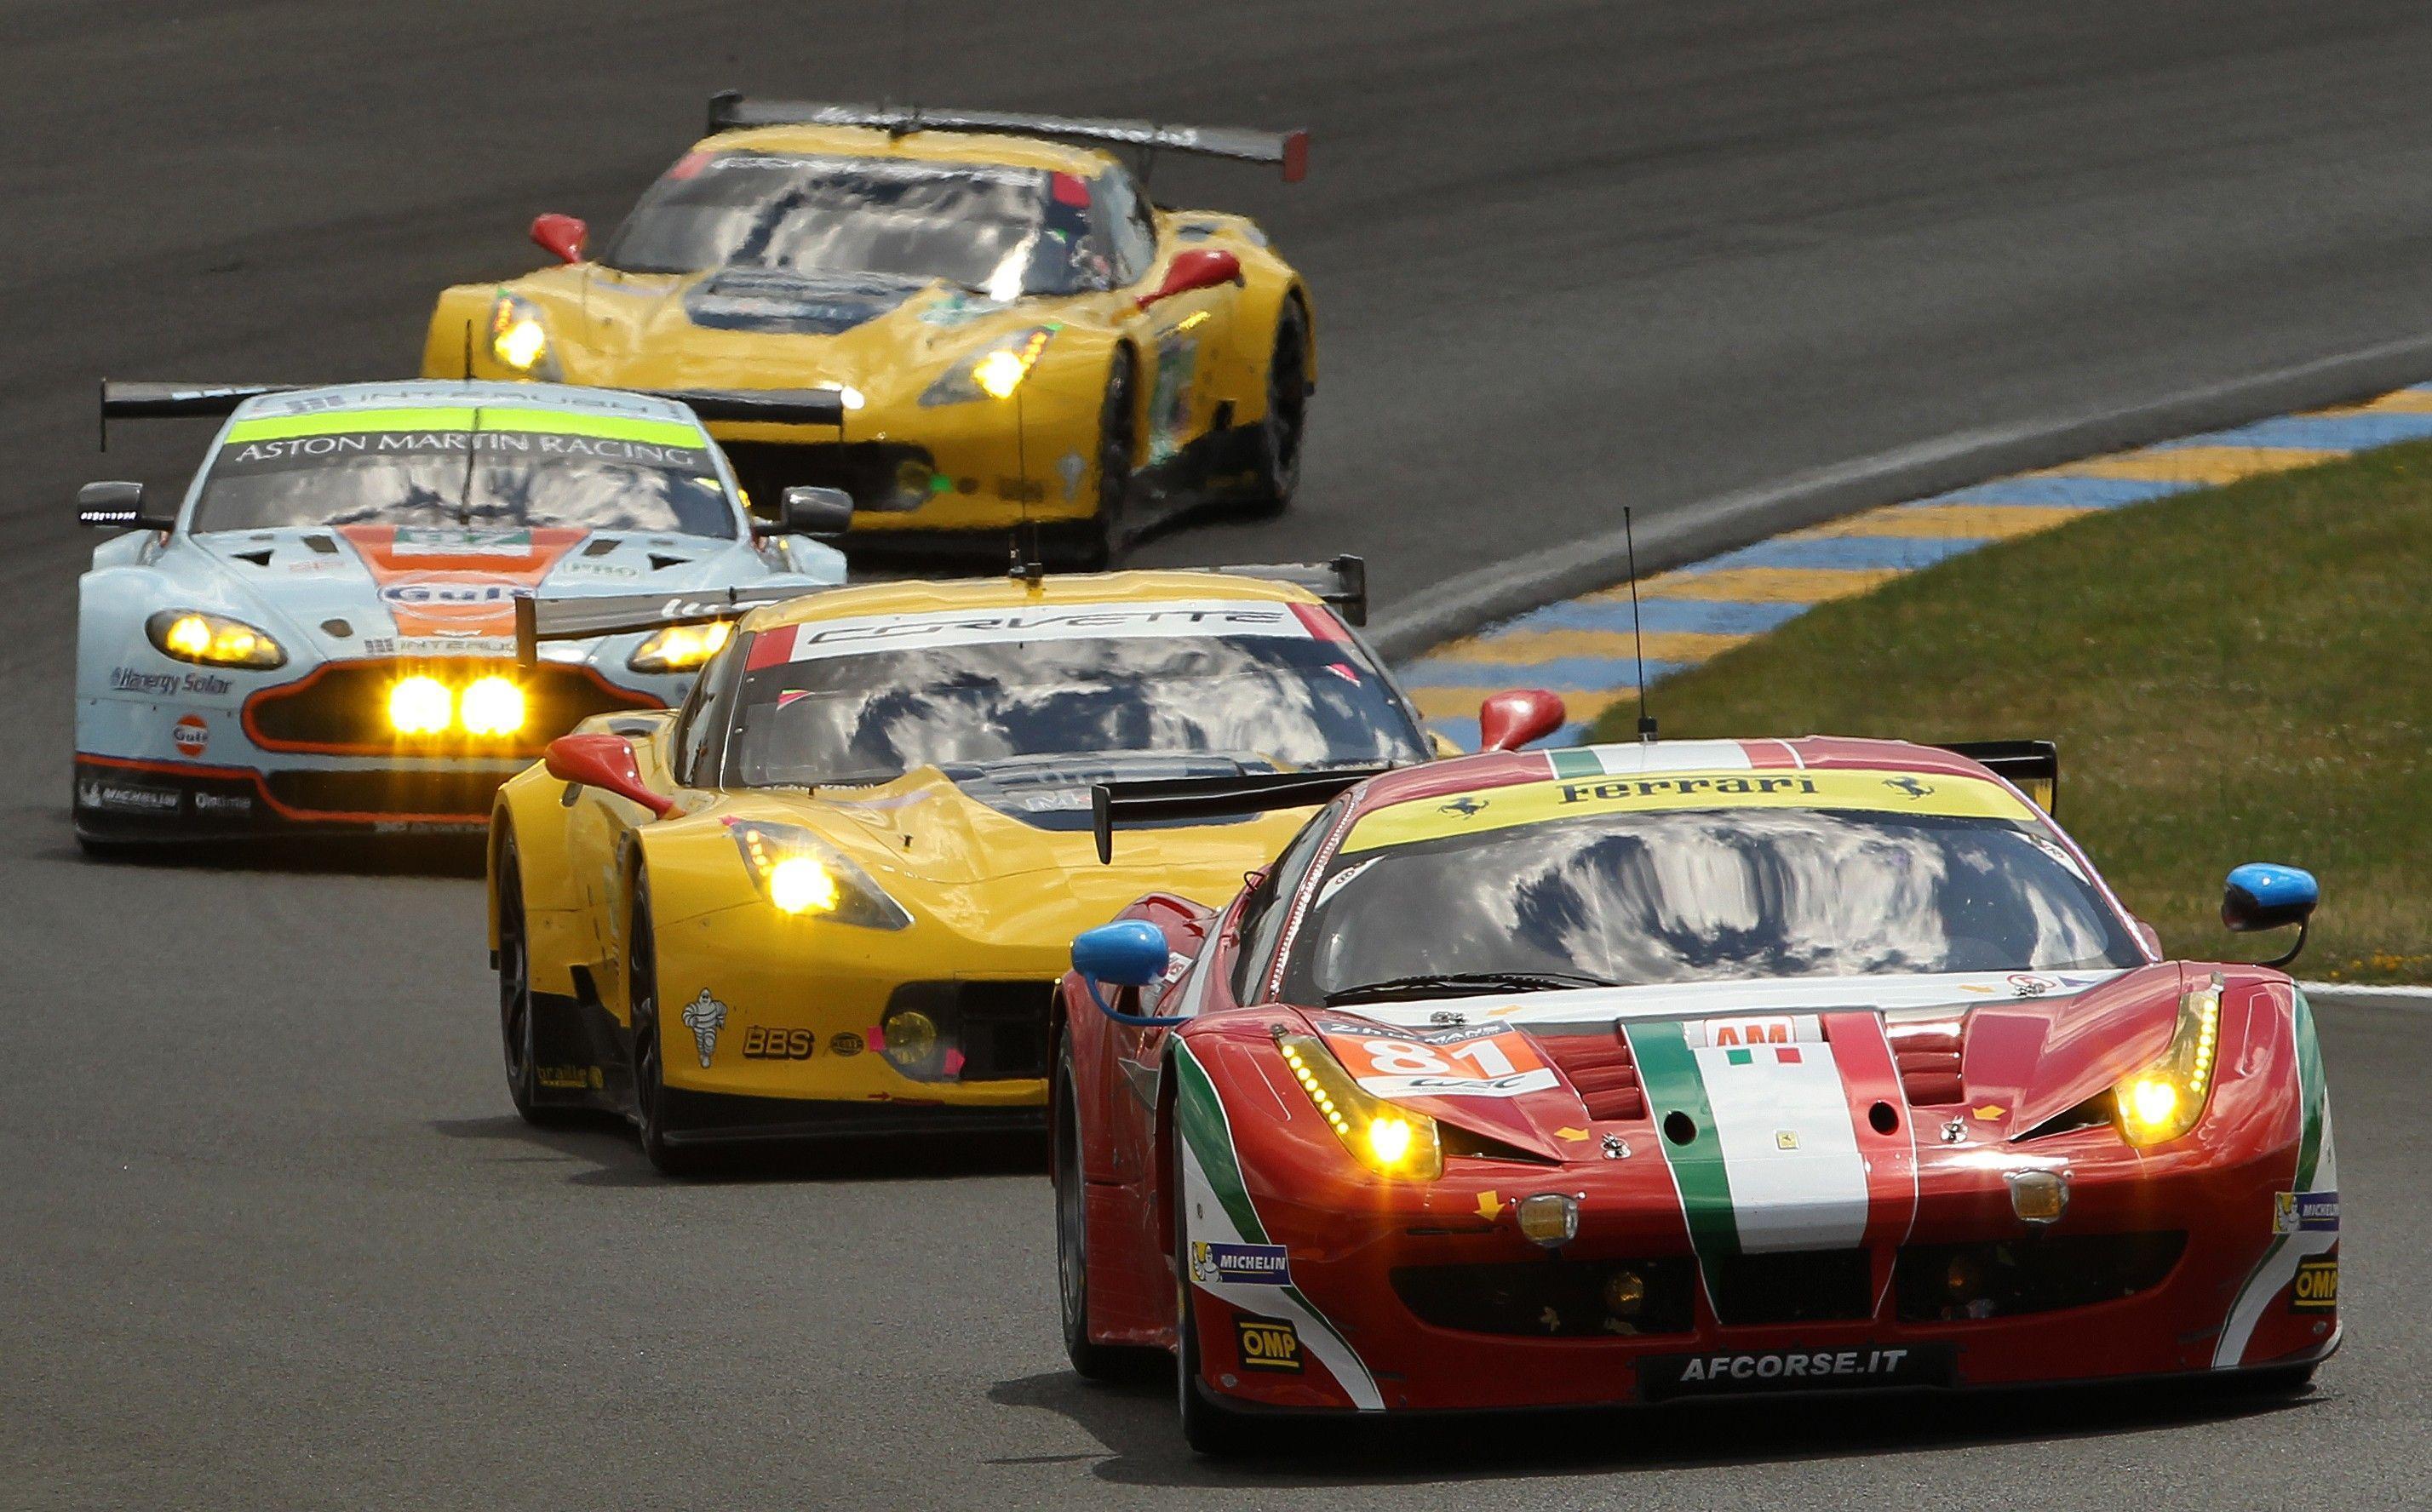 car, Le Mans Wallpapers HD / Desktop and Mobile Backgrounds